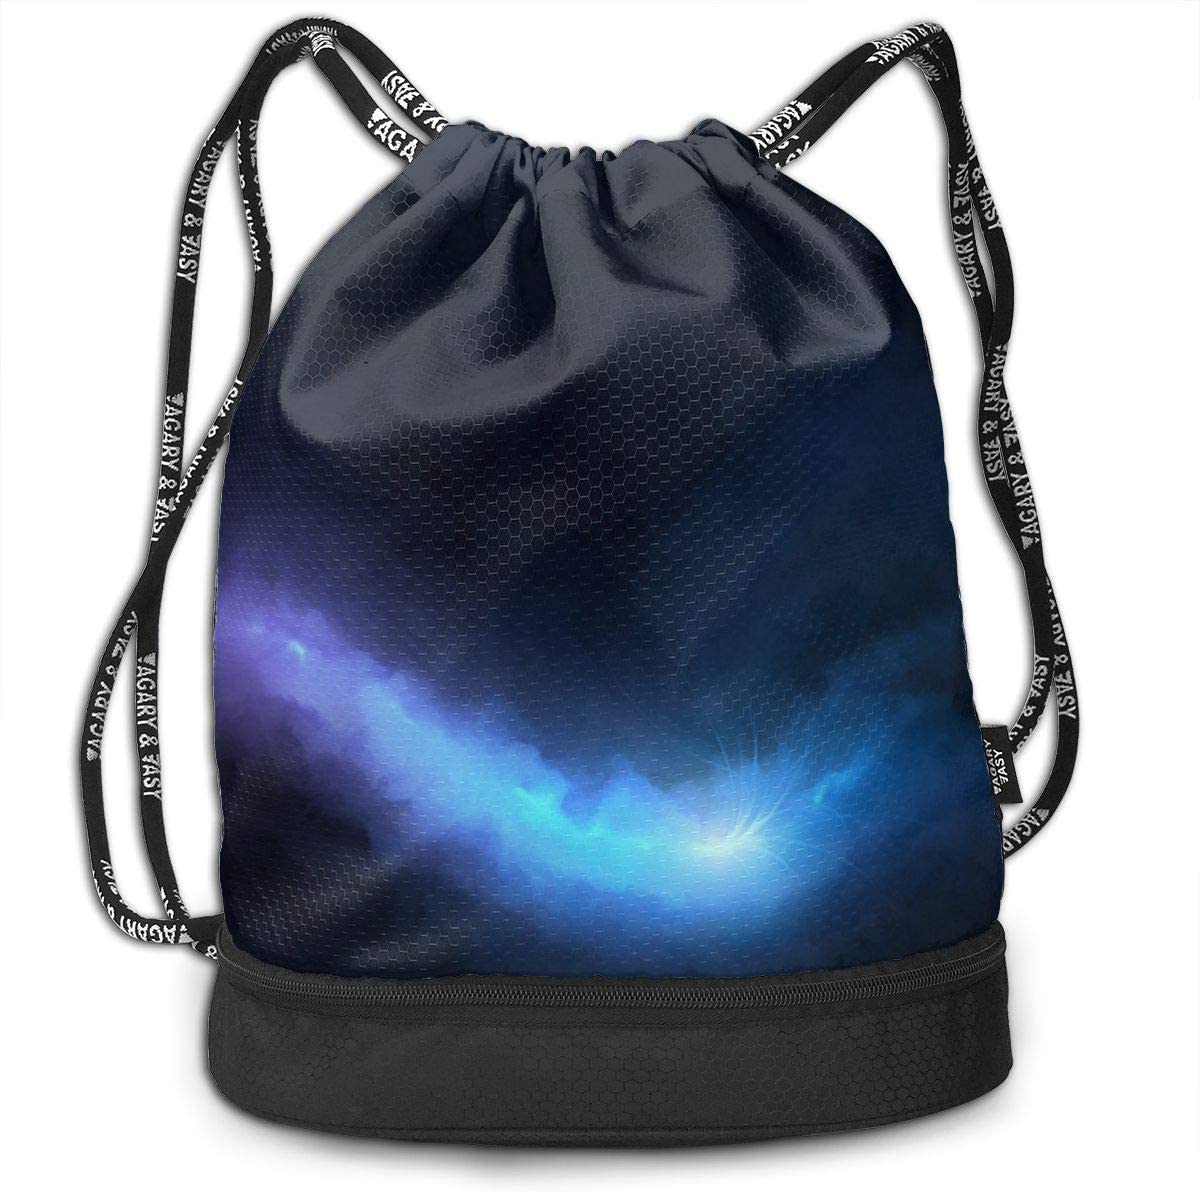 HUOPR5Q Yellow Stars Drawstring Backpack Sport Gym Sack Shoulder Bulk Bag Dance Bag for School Travel